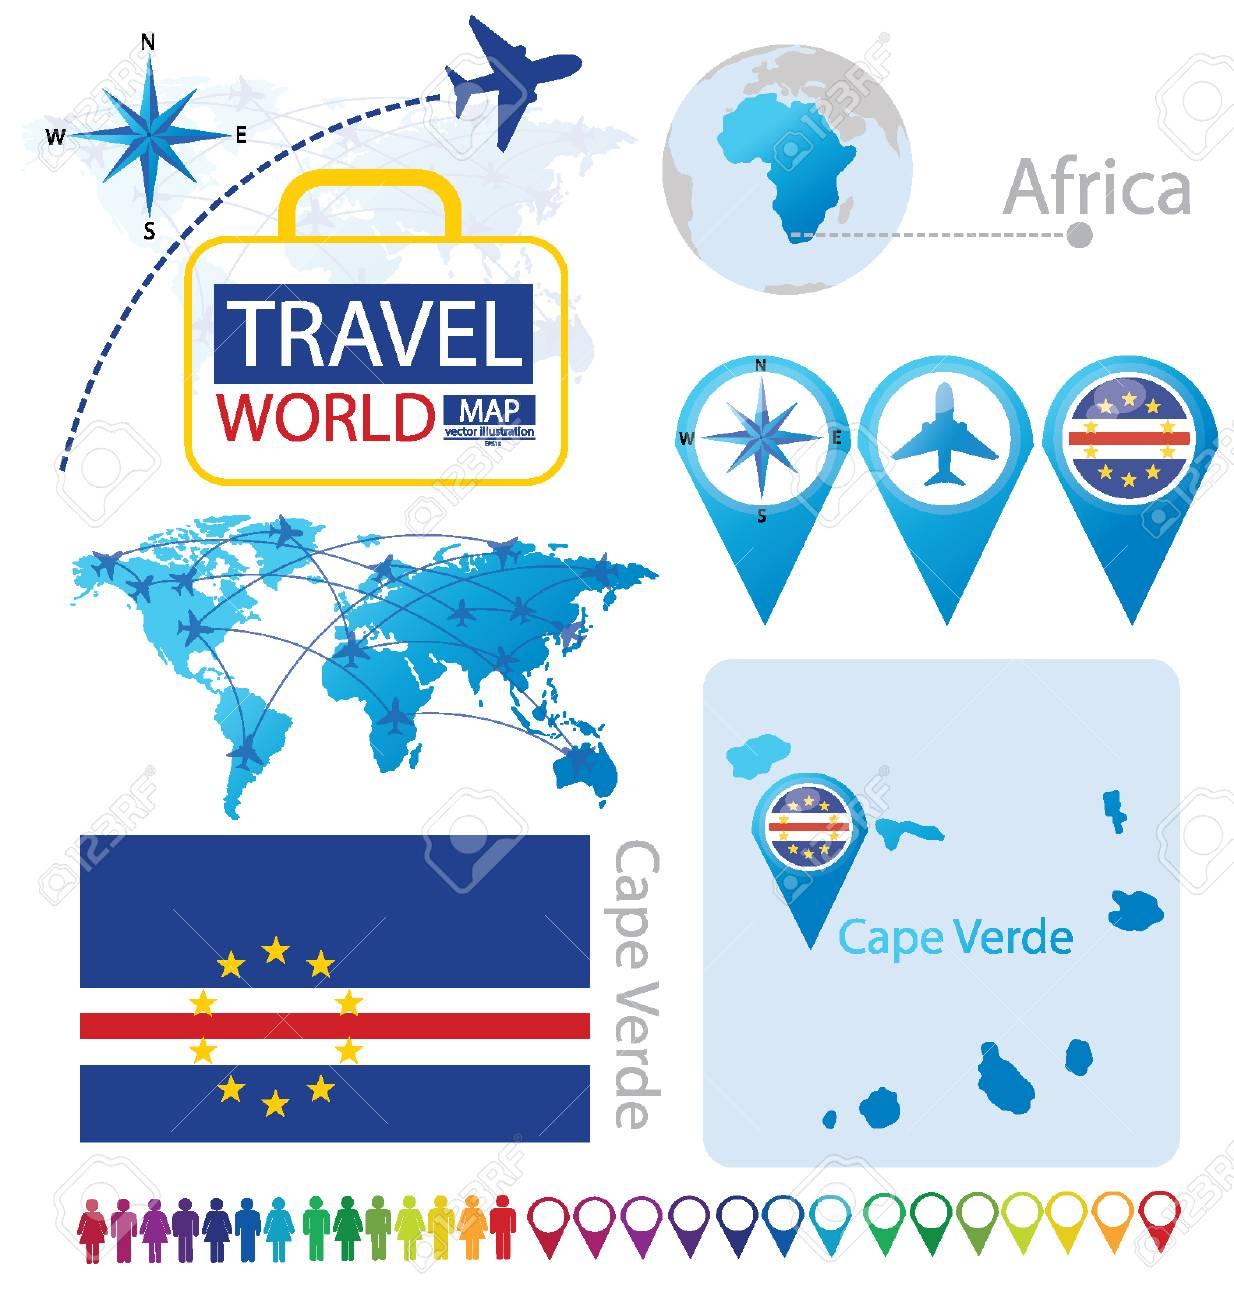 Cape Verde Flag World Map Travel Vector Illustration Royalty